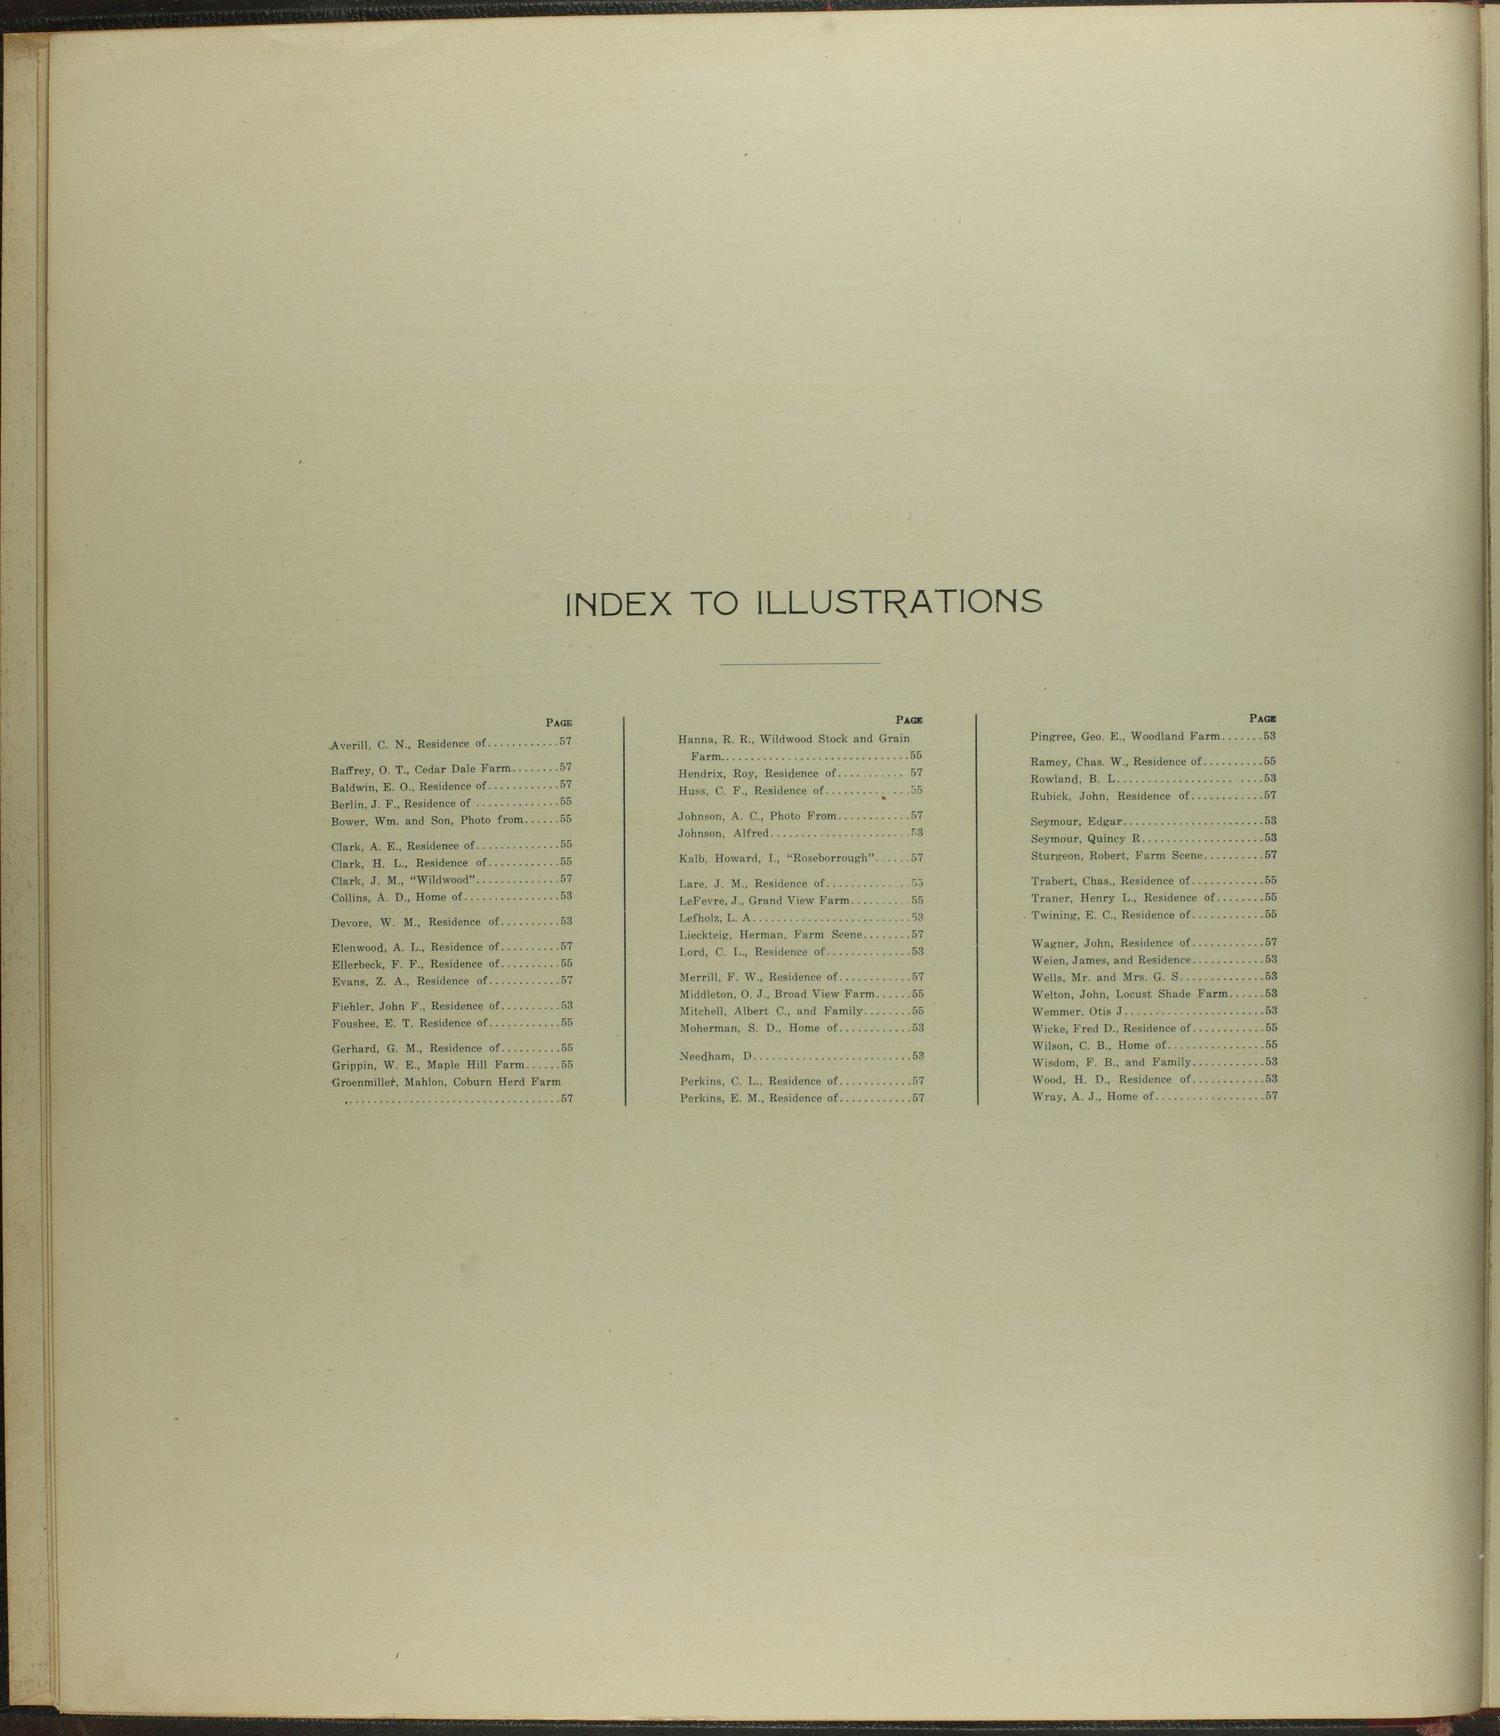 Standard atlas of Franklin County, Kansas - Index to Illustrations